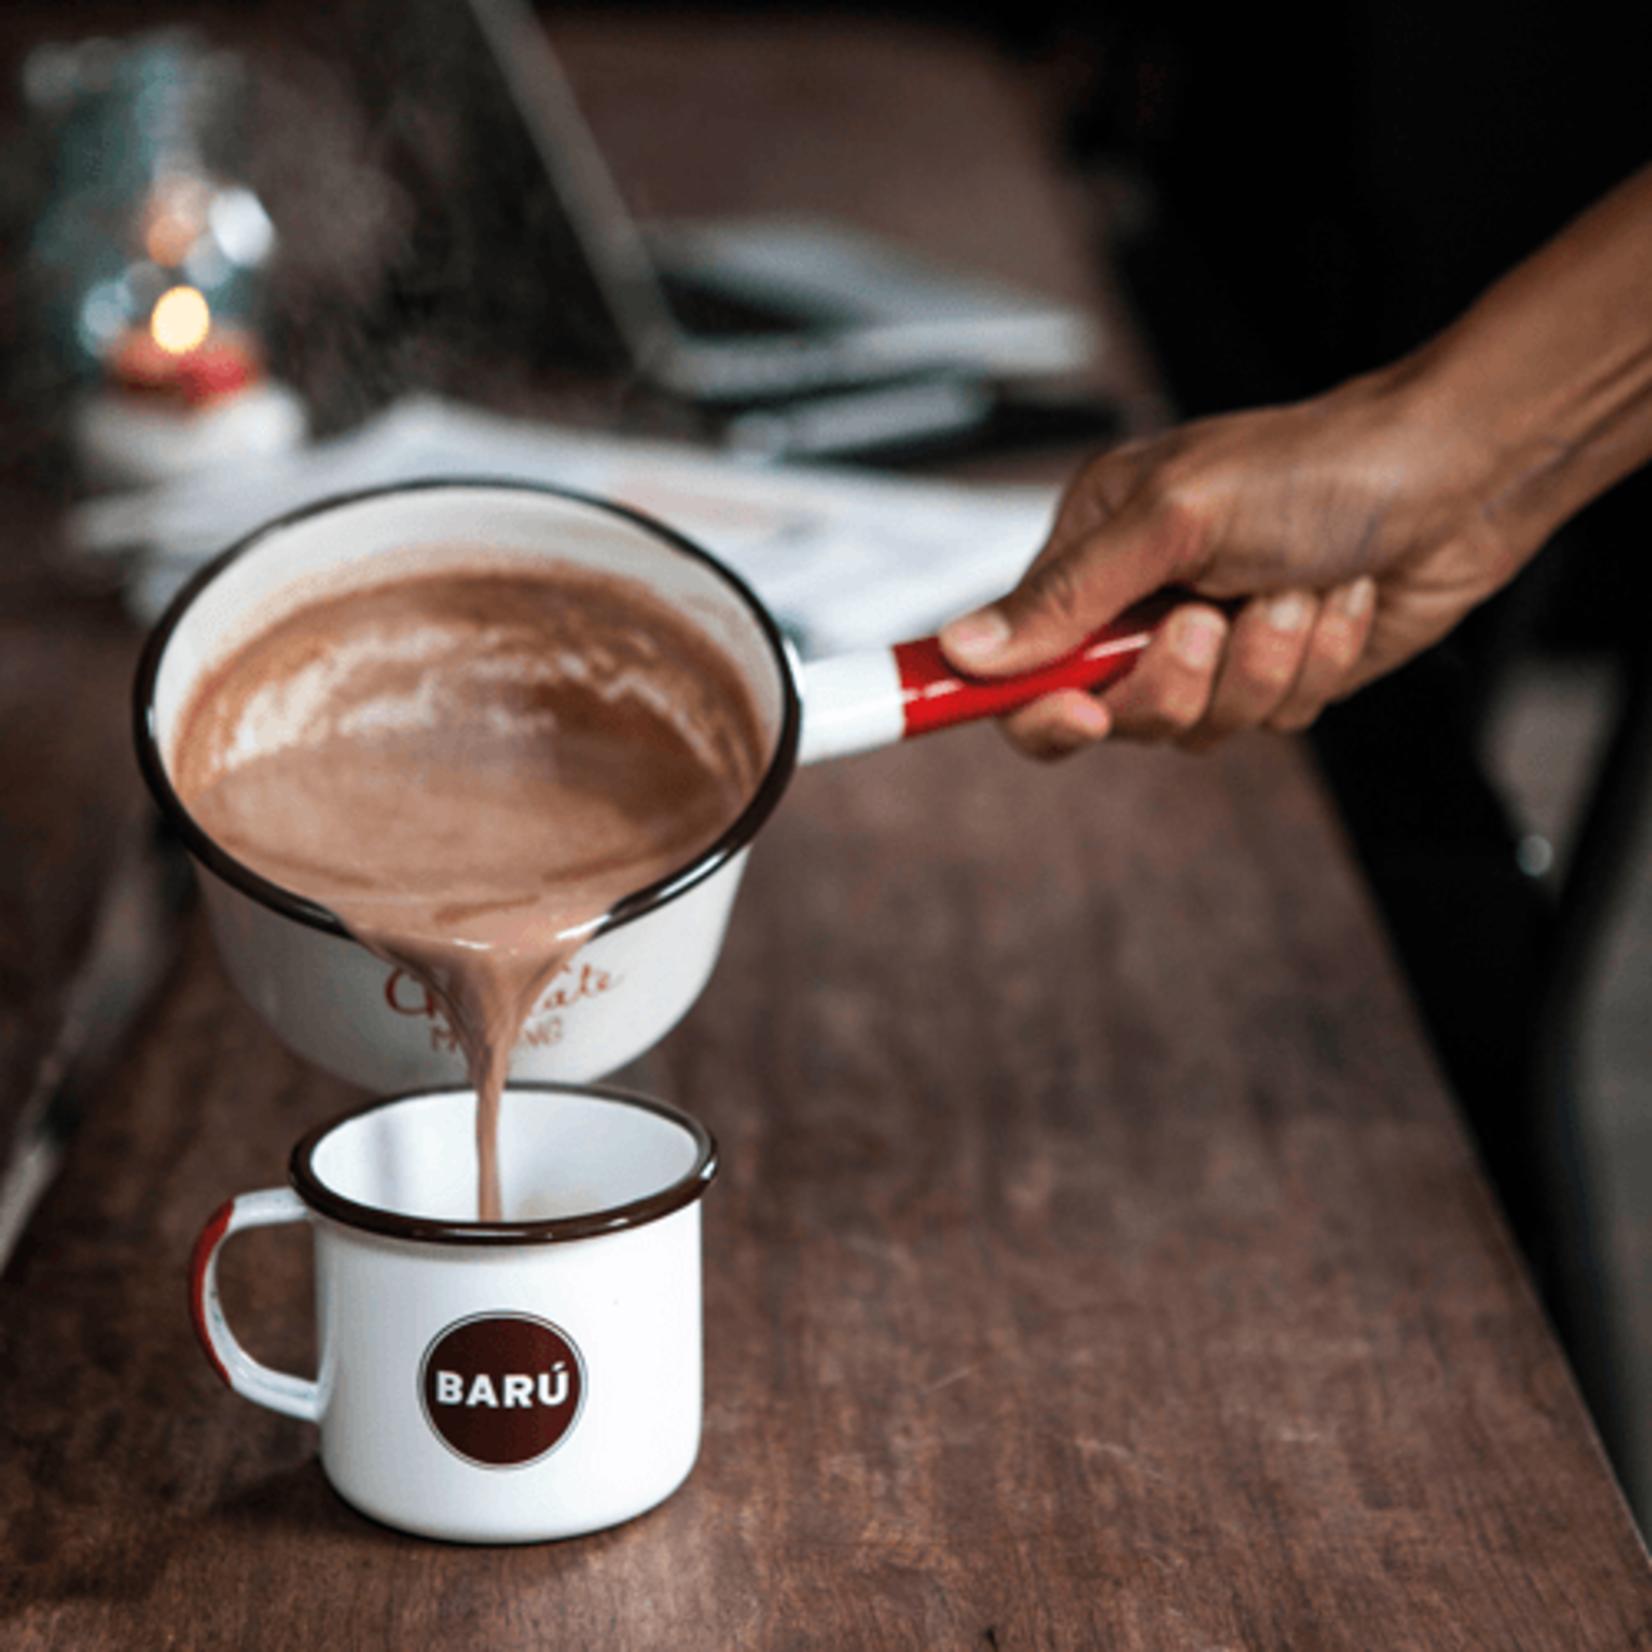 Baru Swirly Hot Chocolate Powder 250g/12cups